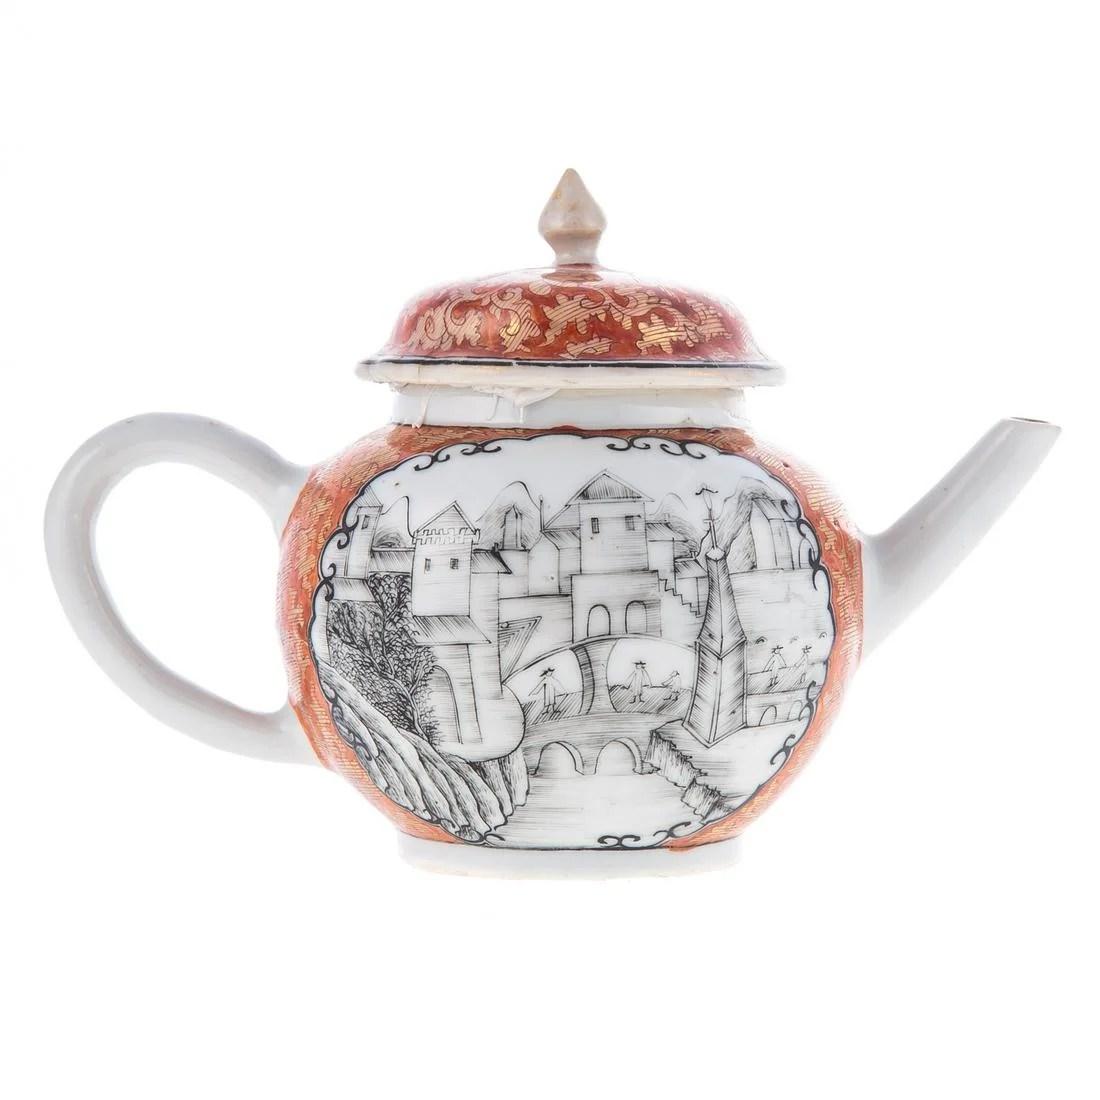 Rare Chinese Export European Scene Teapot